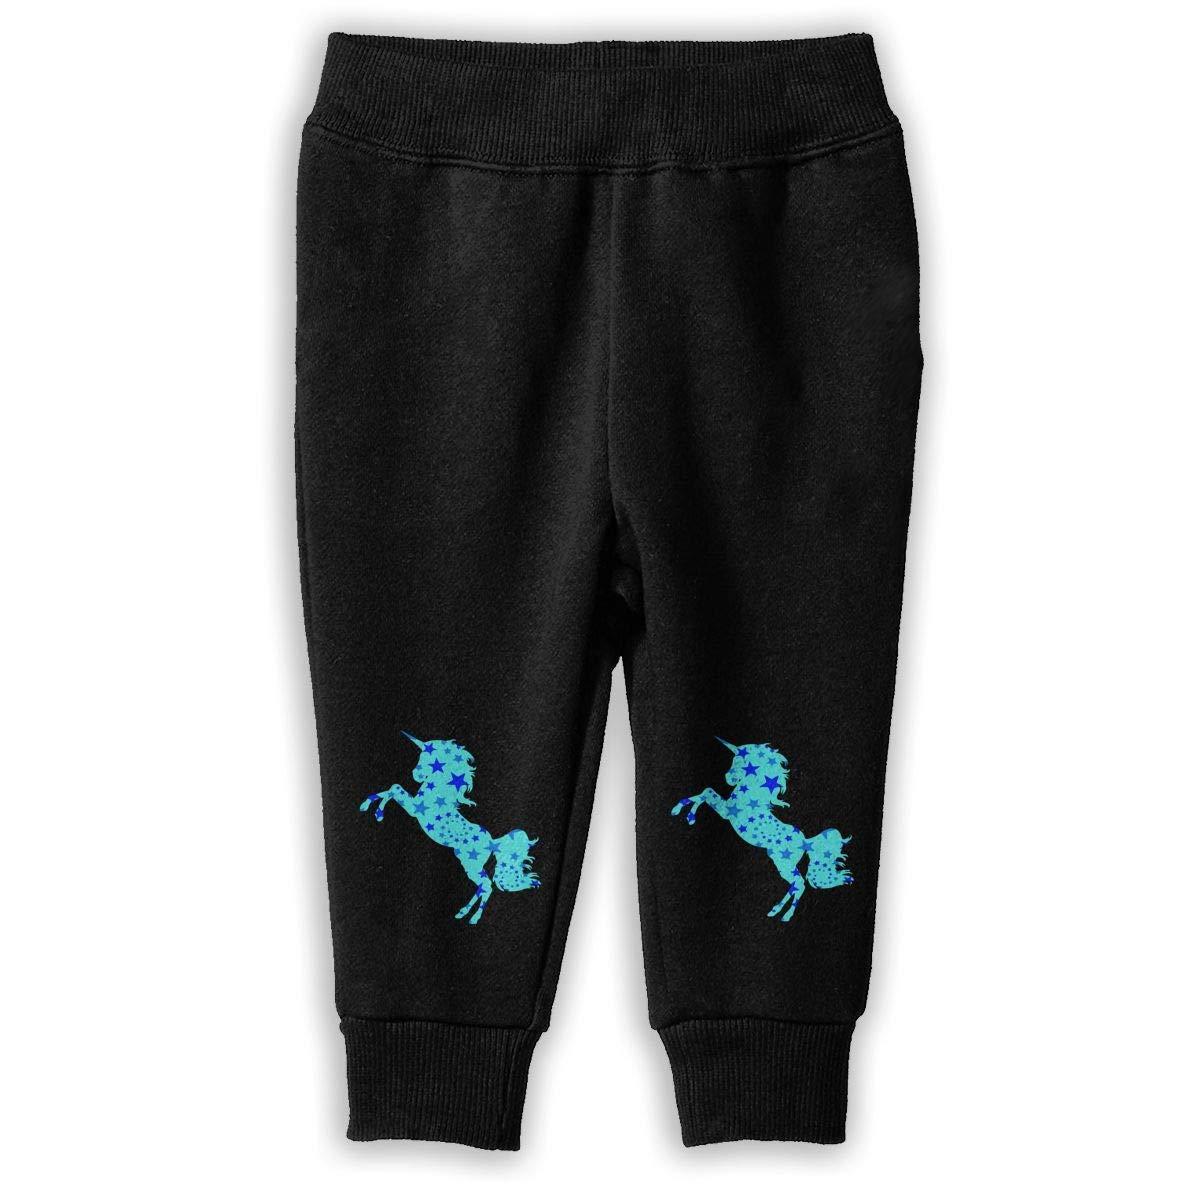 Kids Fleece Pants lu fangfangc Galaxy Unicorn Sweatpants